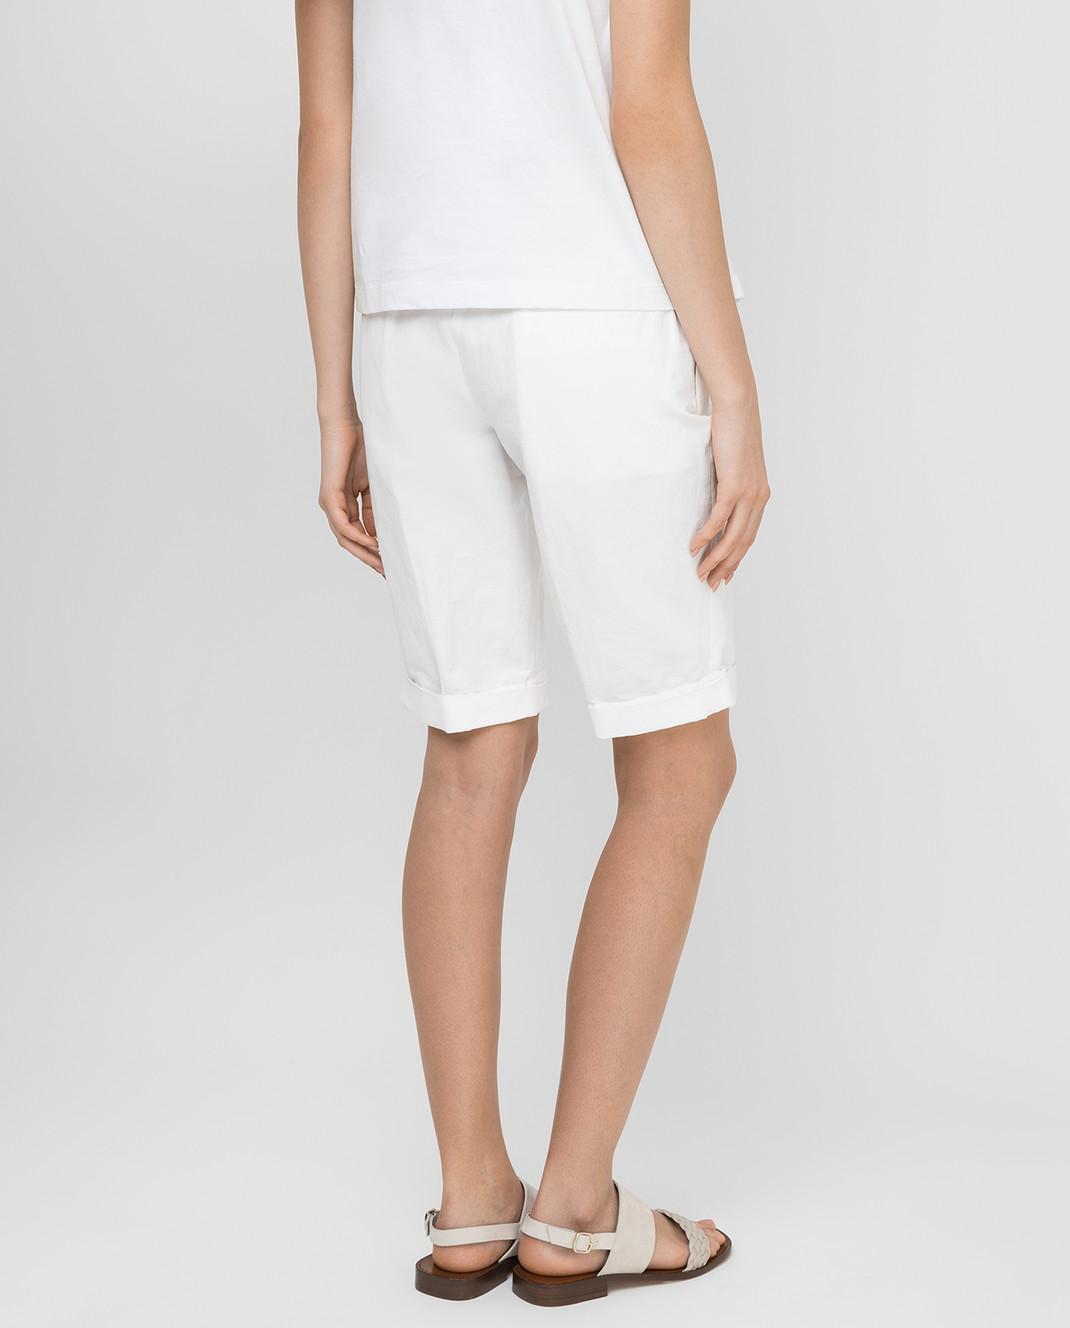 Marni Белые шорты PAMAN47A10TL234 изображение 4